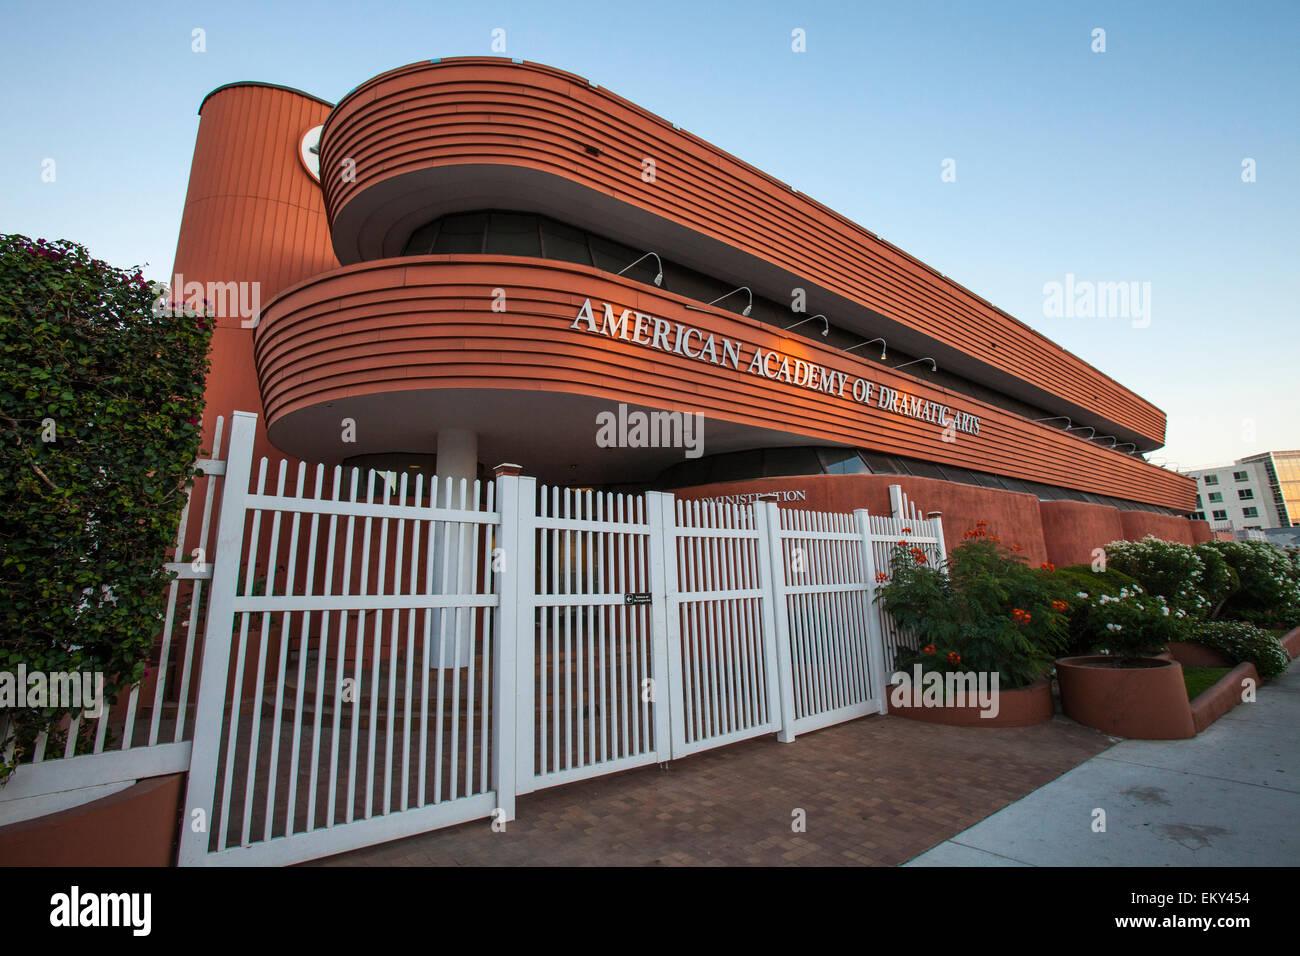 American Academy of Dramatic Arts, Hollywood, Kalifornien, USA Stockbild